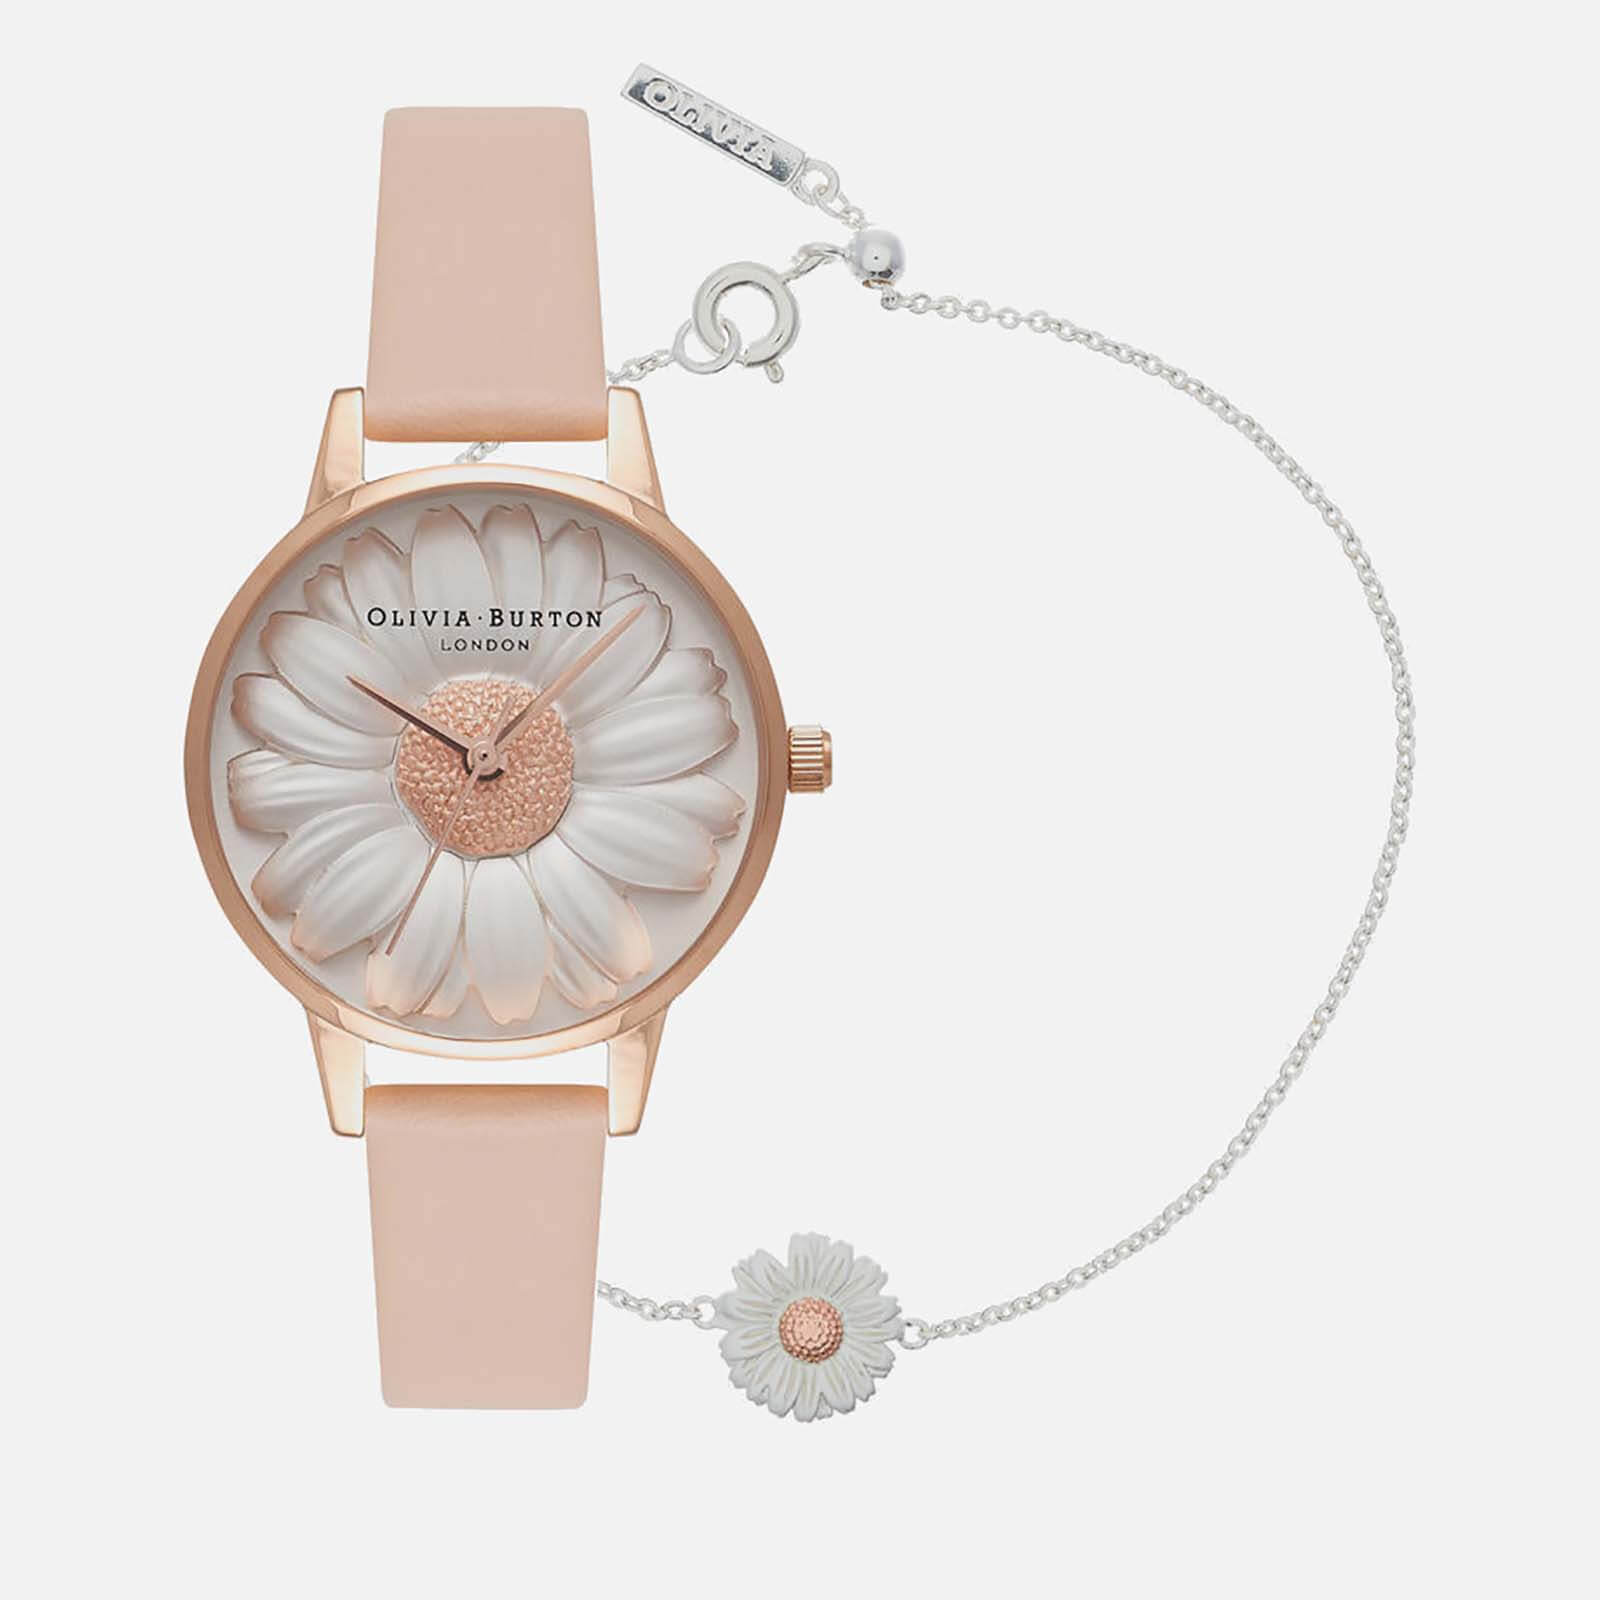 0de60d194f3f68 Olivia Burton Women's 3D Daisy Watch and Bracelet Gift Set - Rose ...